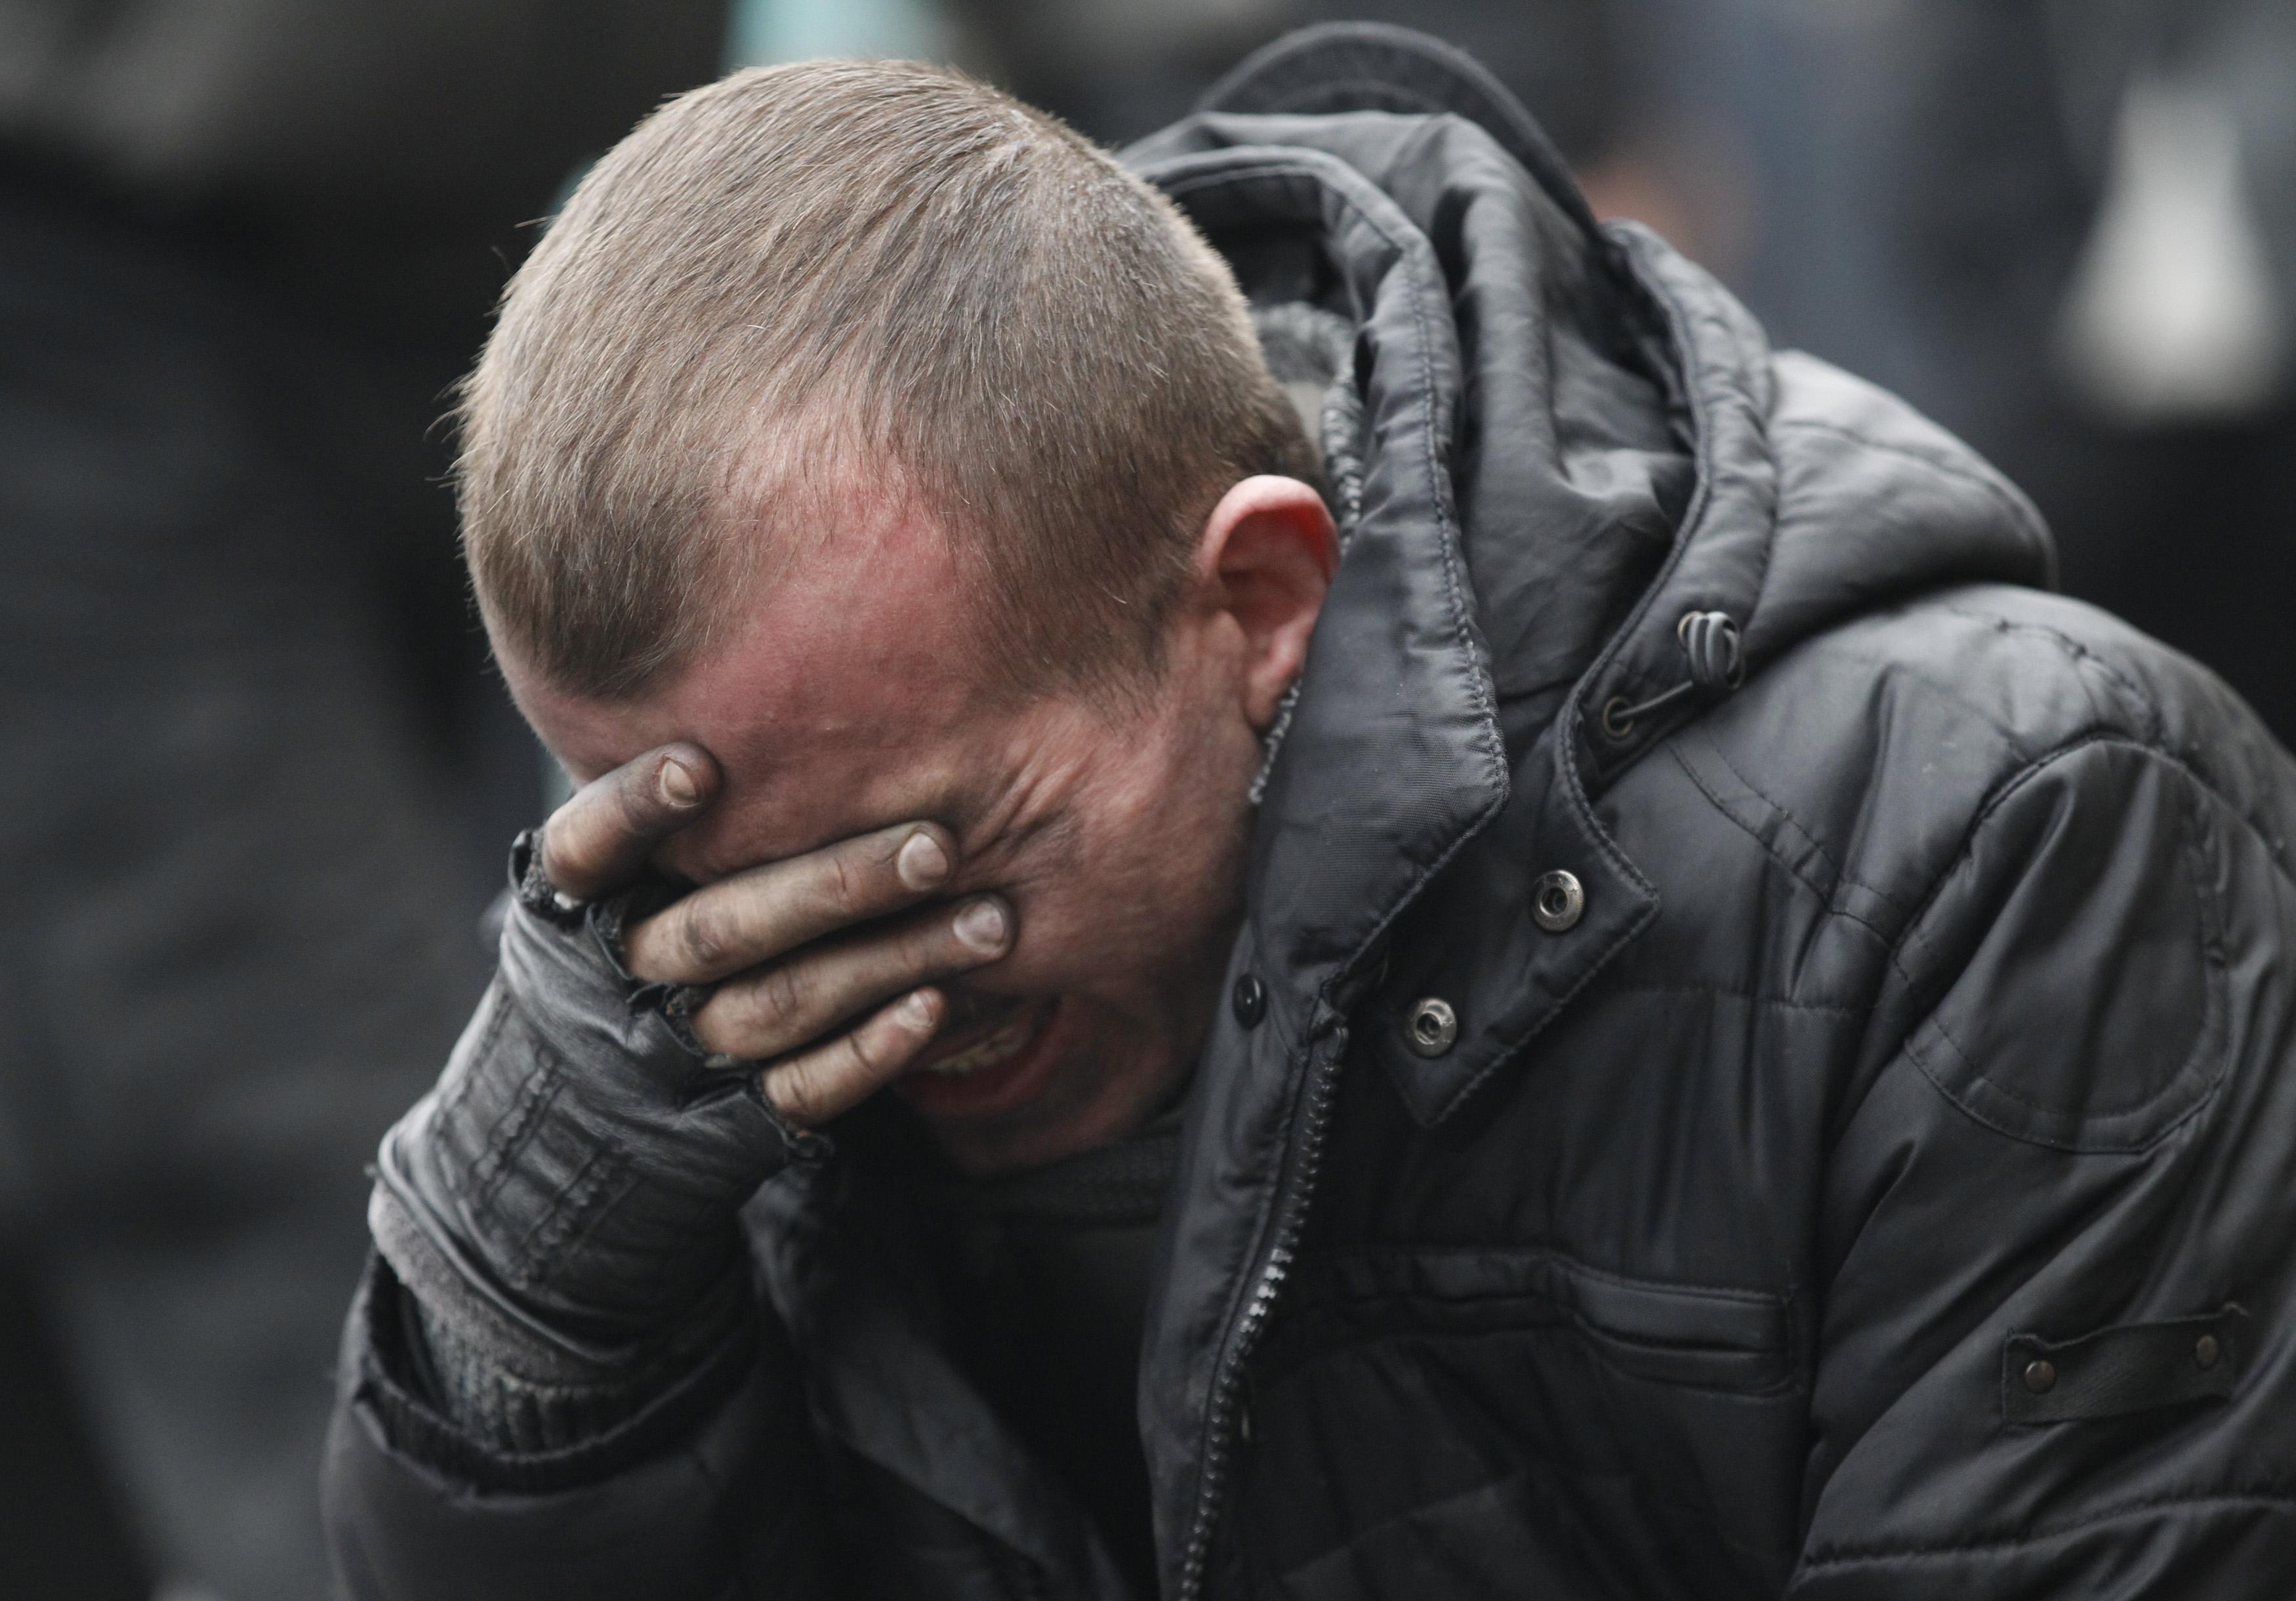 Майдан. День скорби. 20 февраля